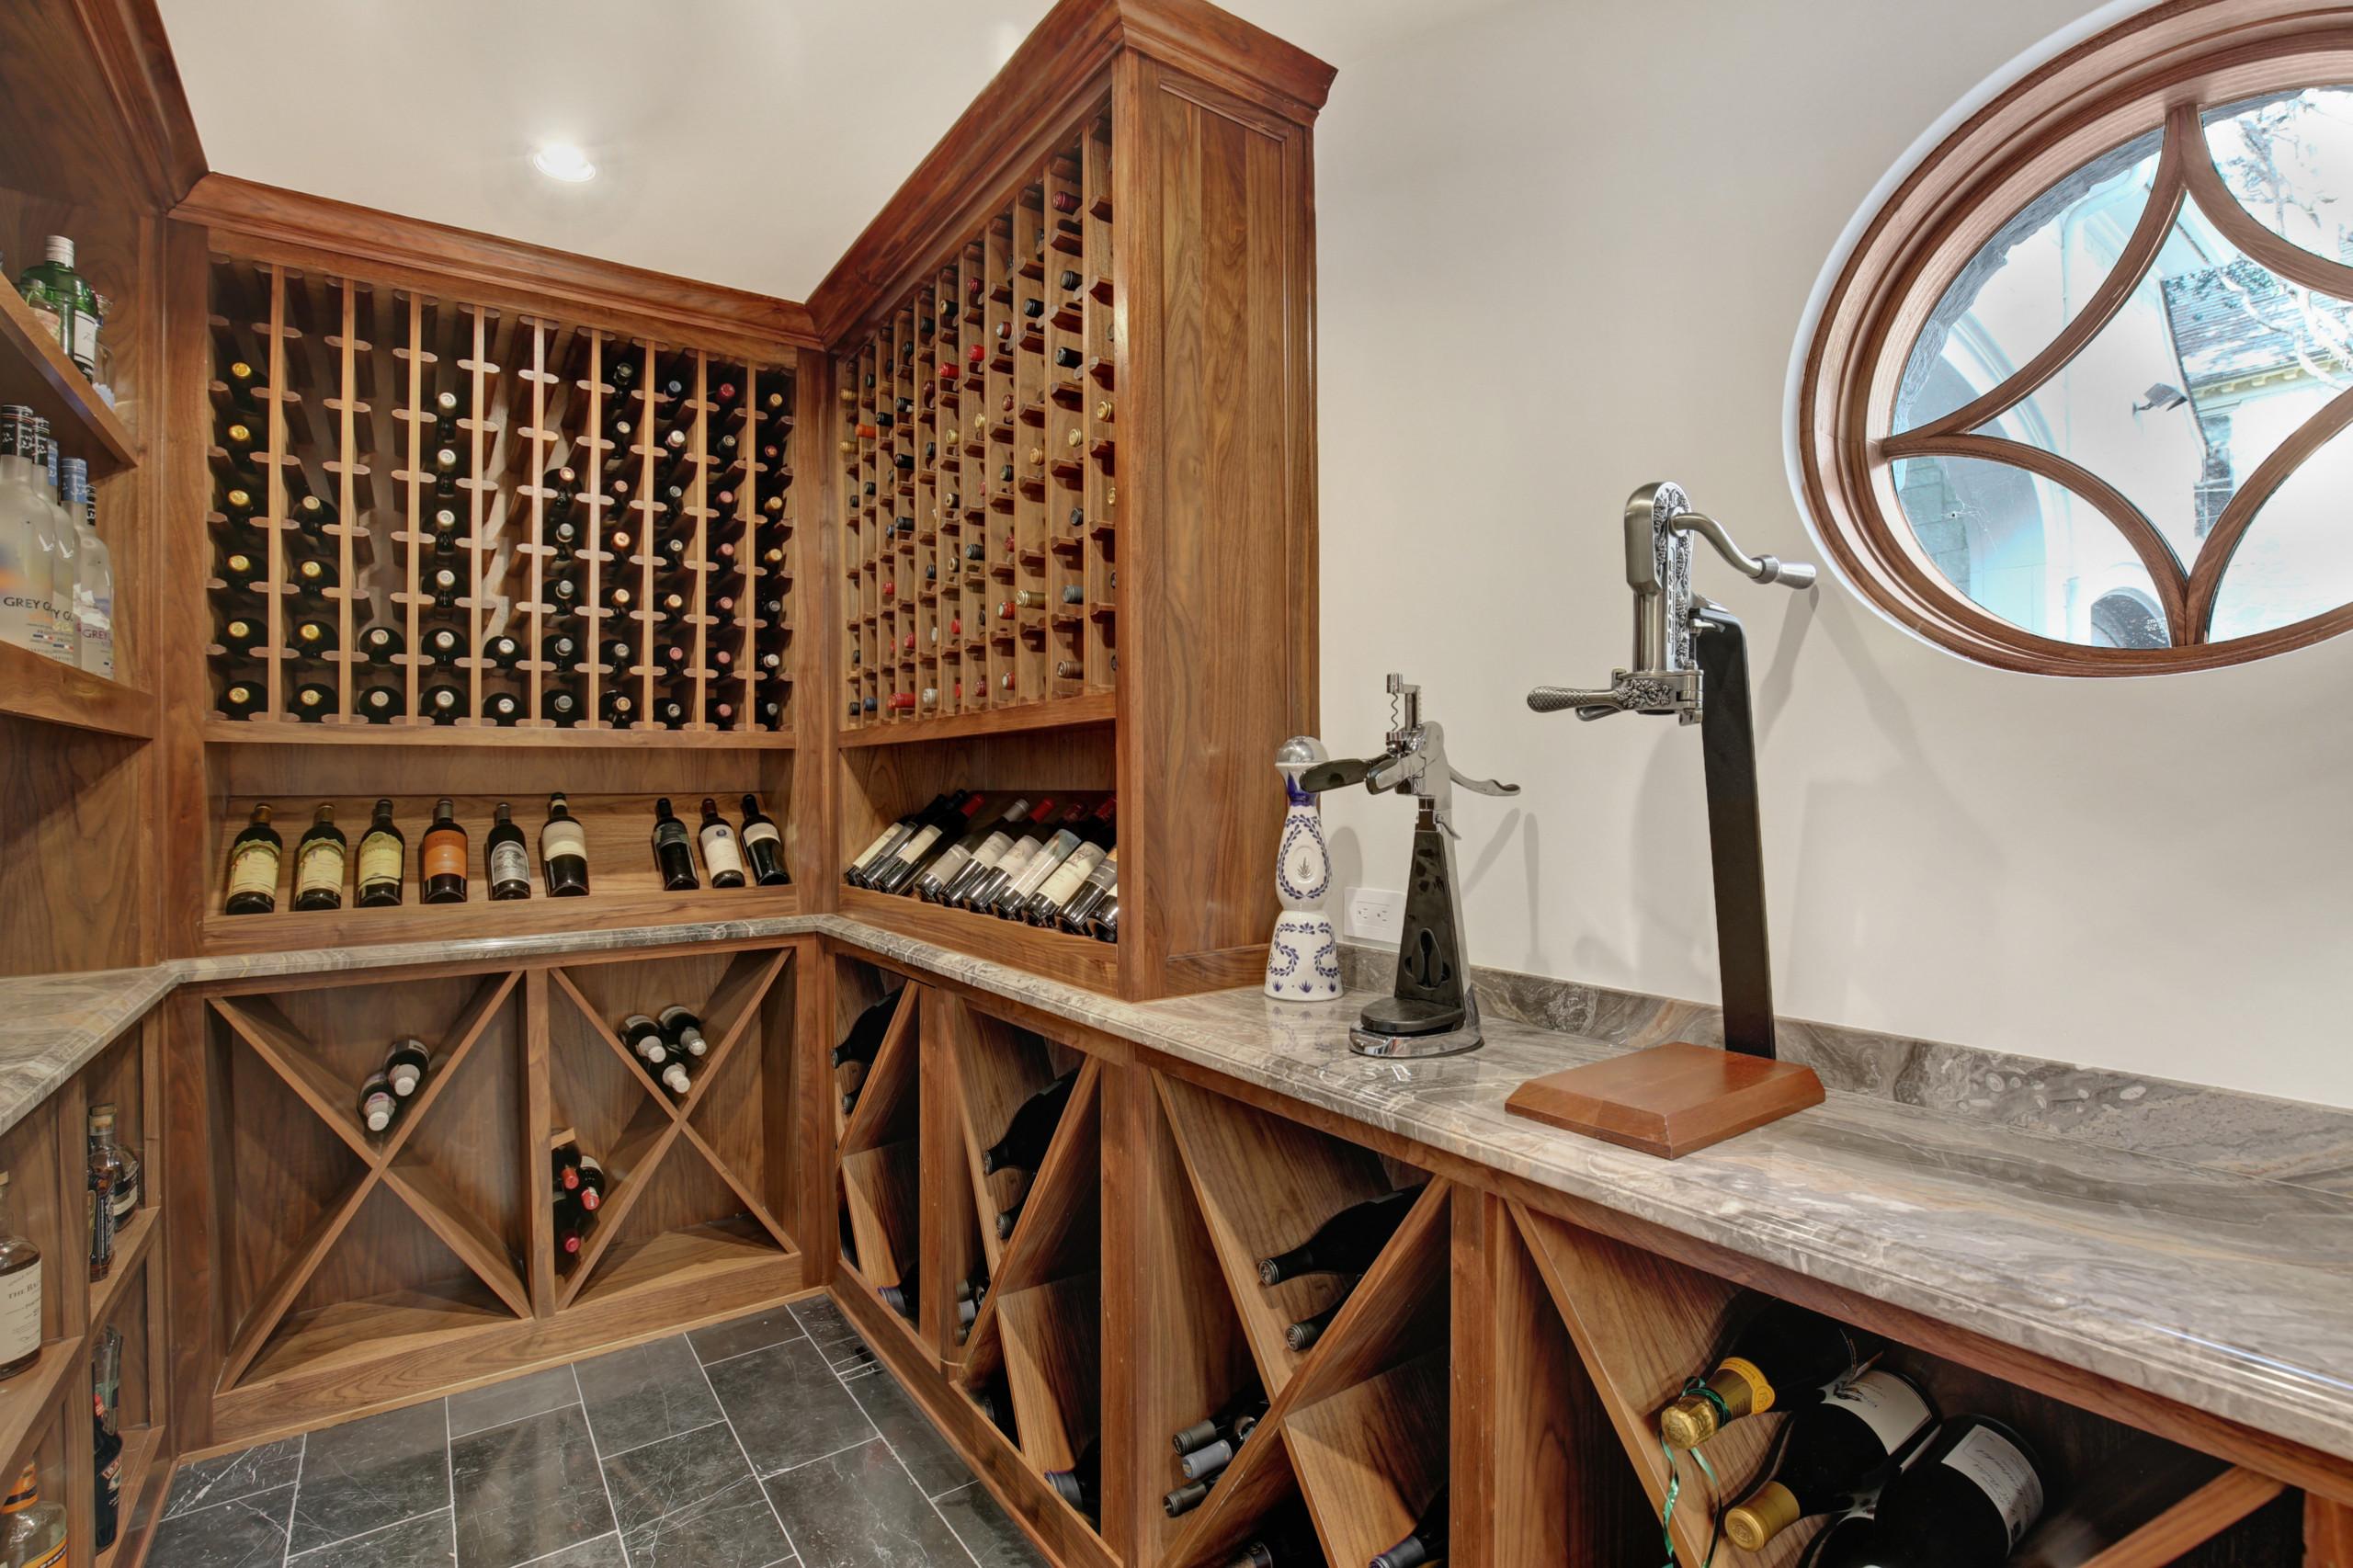 18 Lavish Mediterranean Wine Cellar Designs Every True Wine Collector Needs